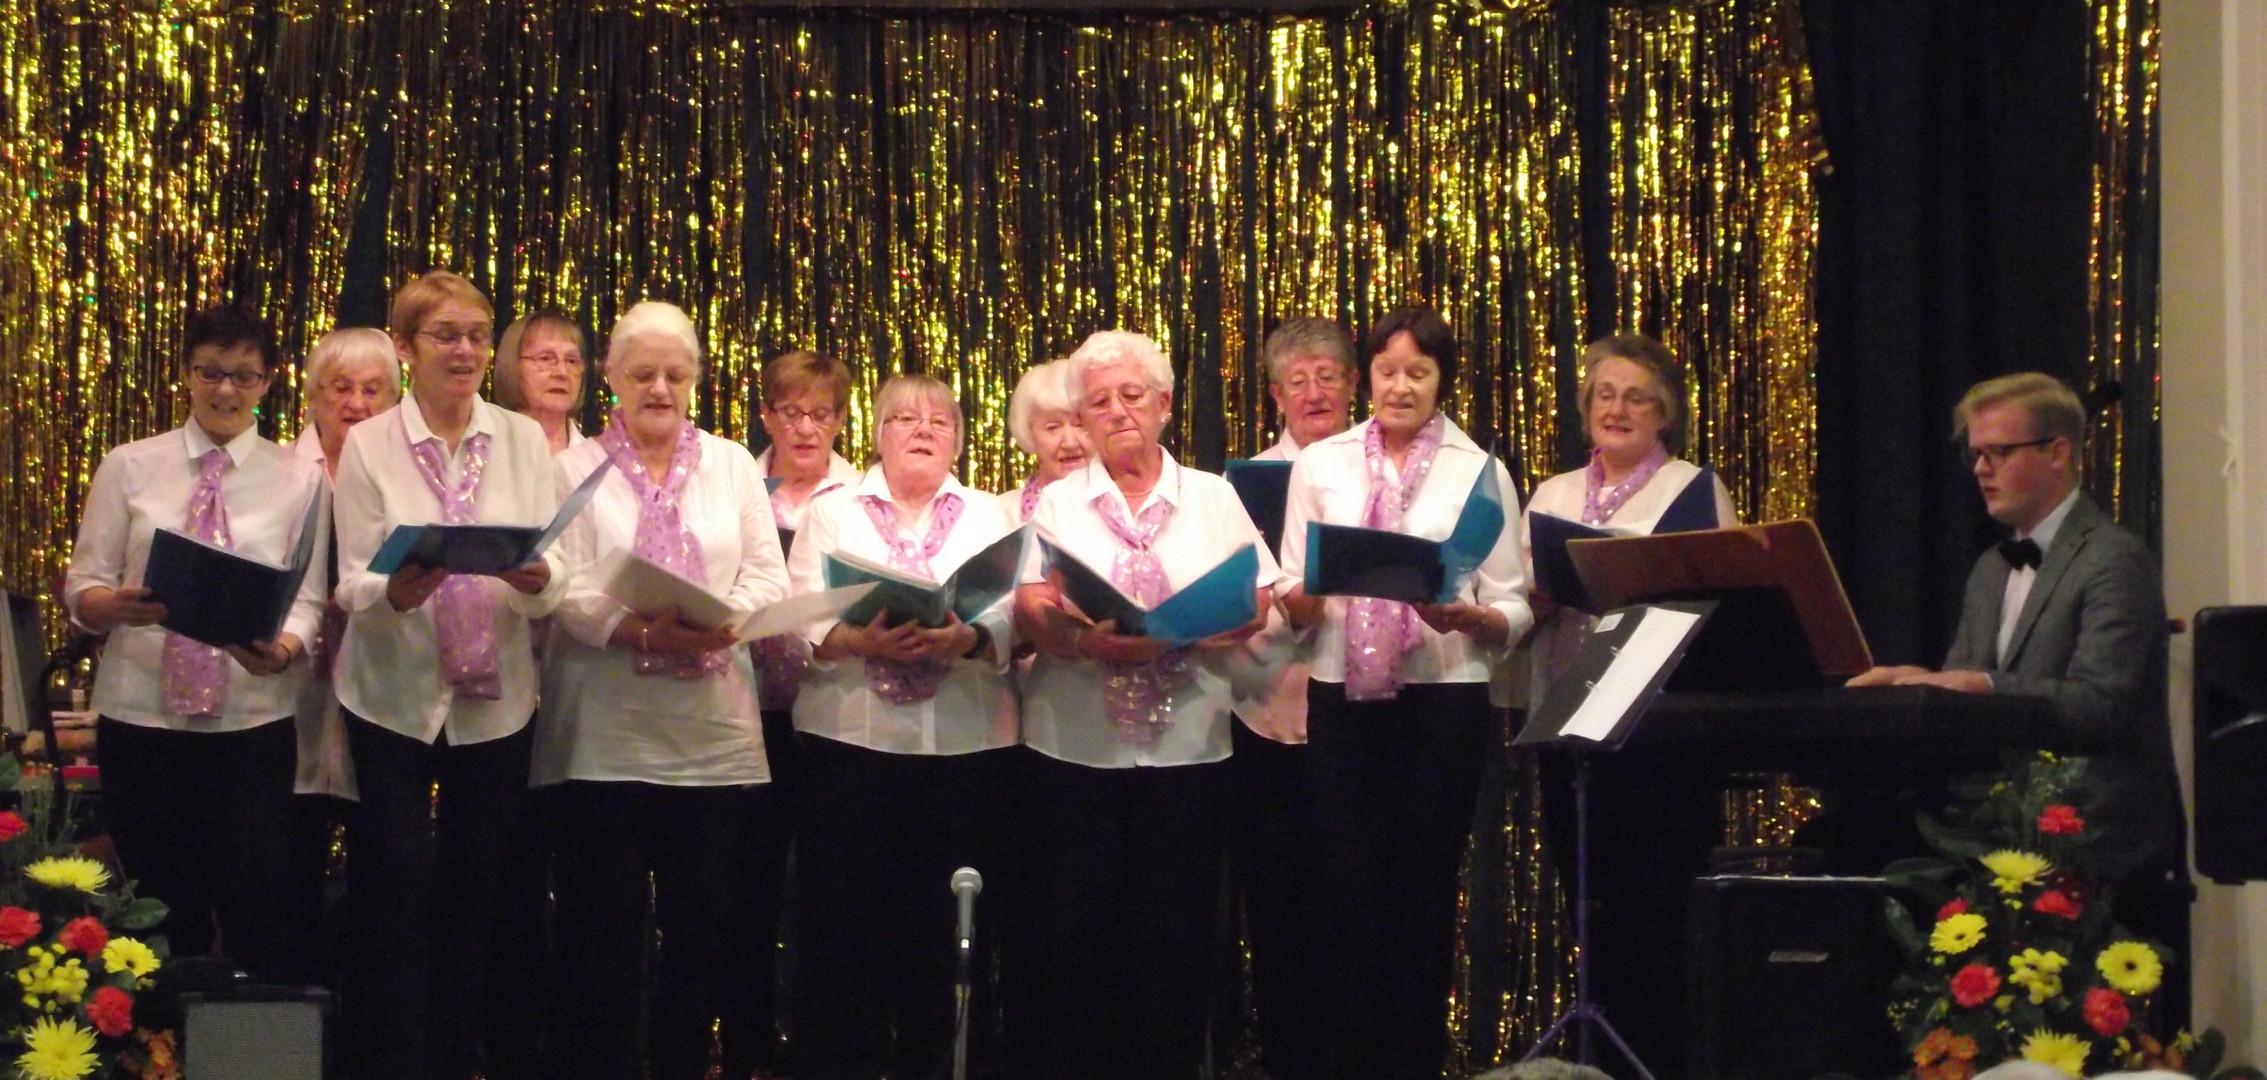 The Choir in Full Voice